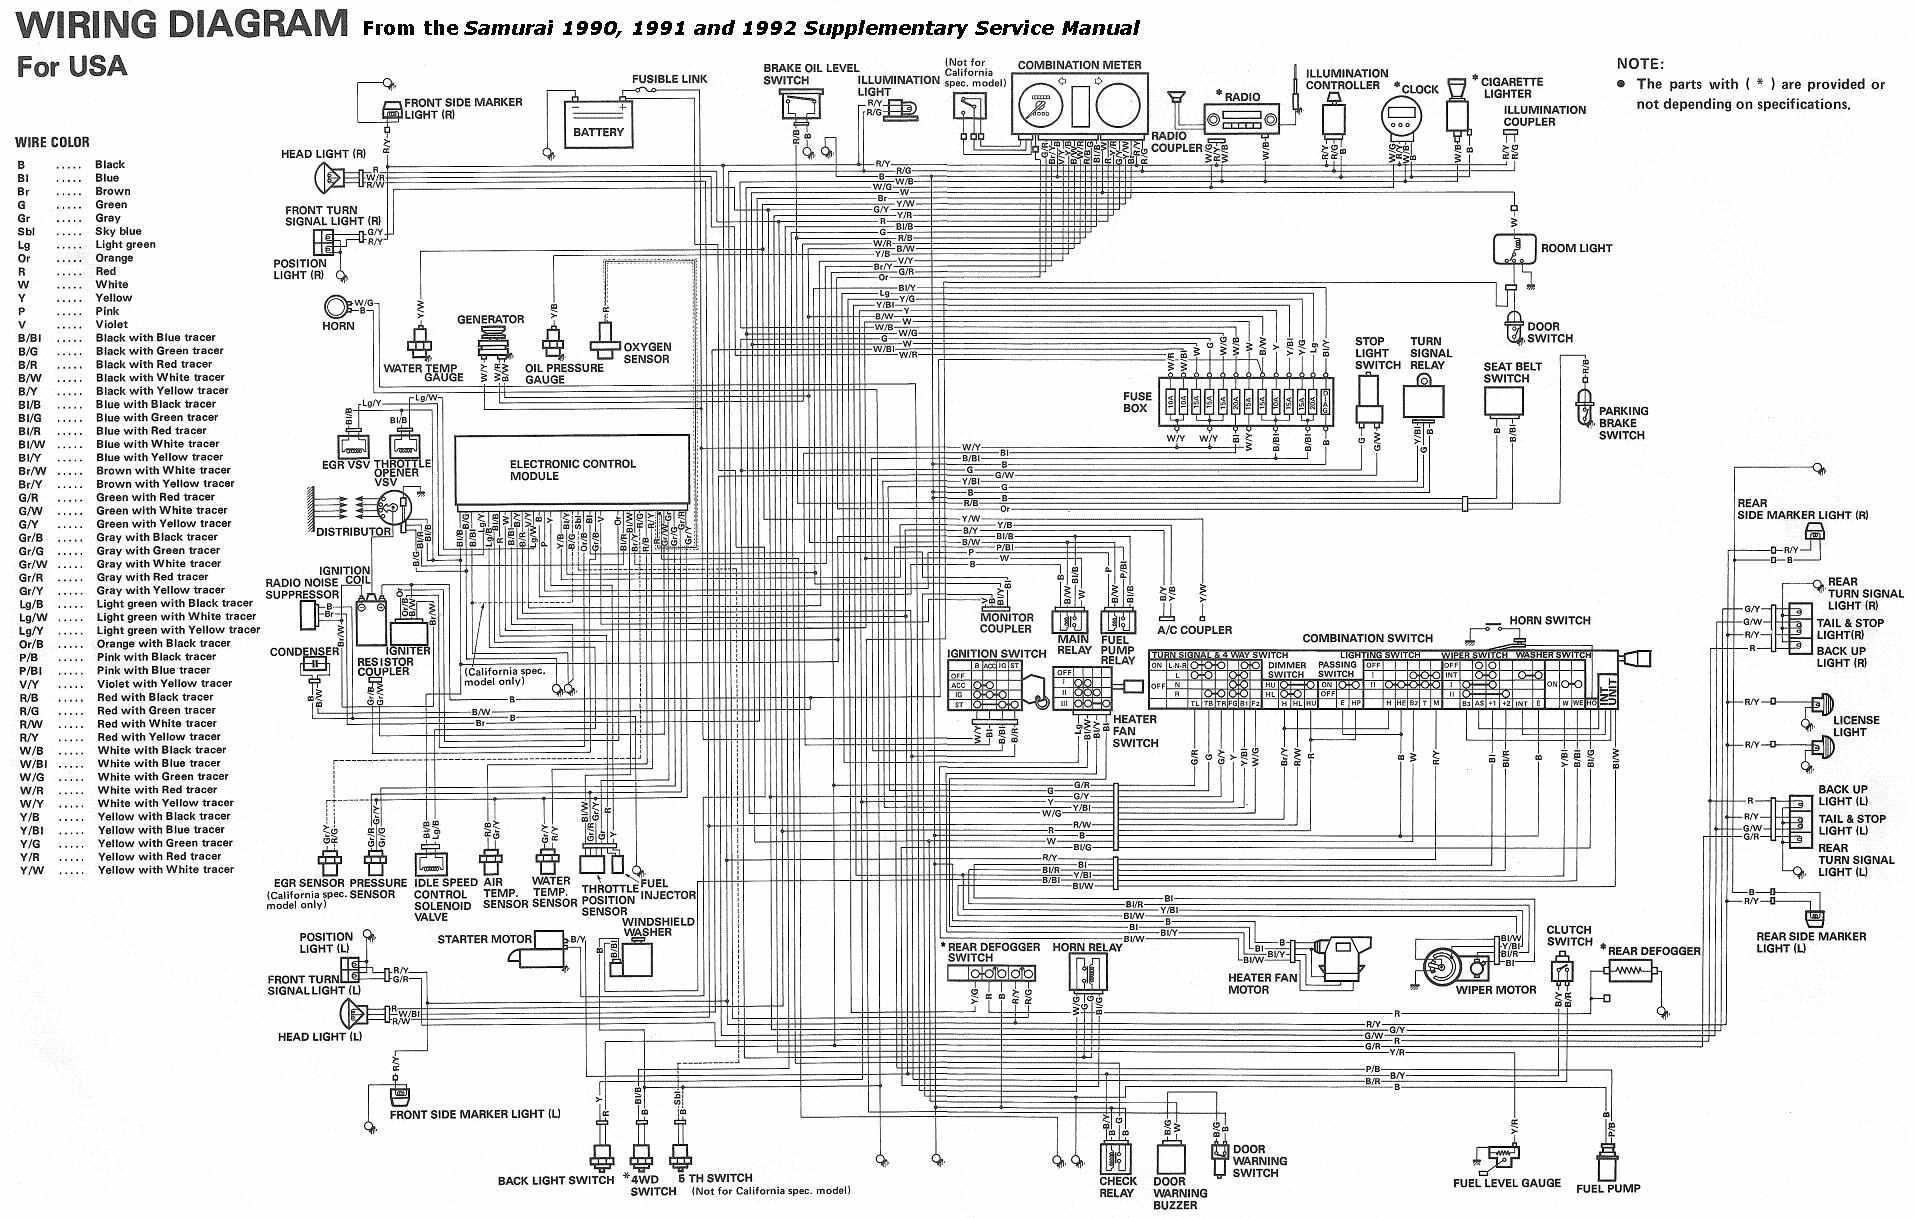 complete electrical wiring diagram of 1990 1992 suzuki samurai?resize=665%2C423&ssl=1 tail light wiring diagram 1995 chevy truck wiring diagram,1990 Chevy 1500 Tail Light Wiring Diagram